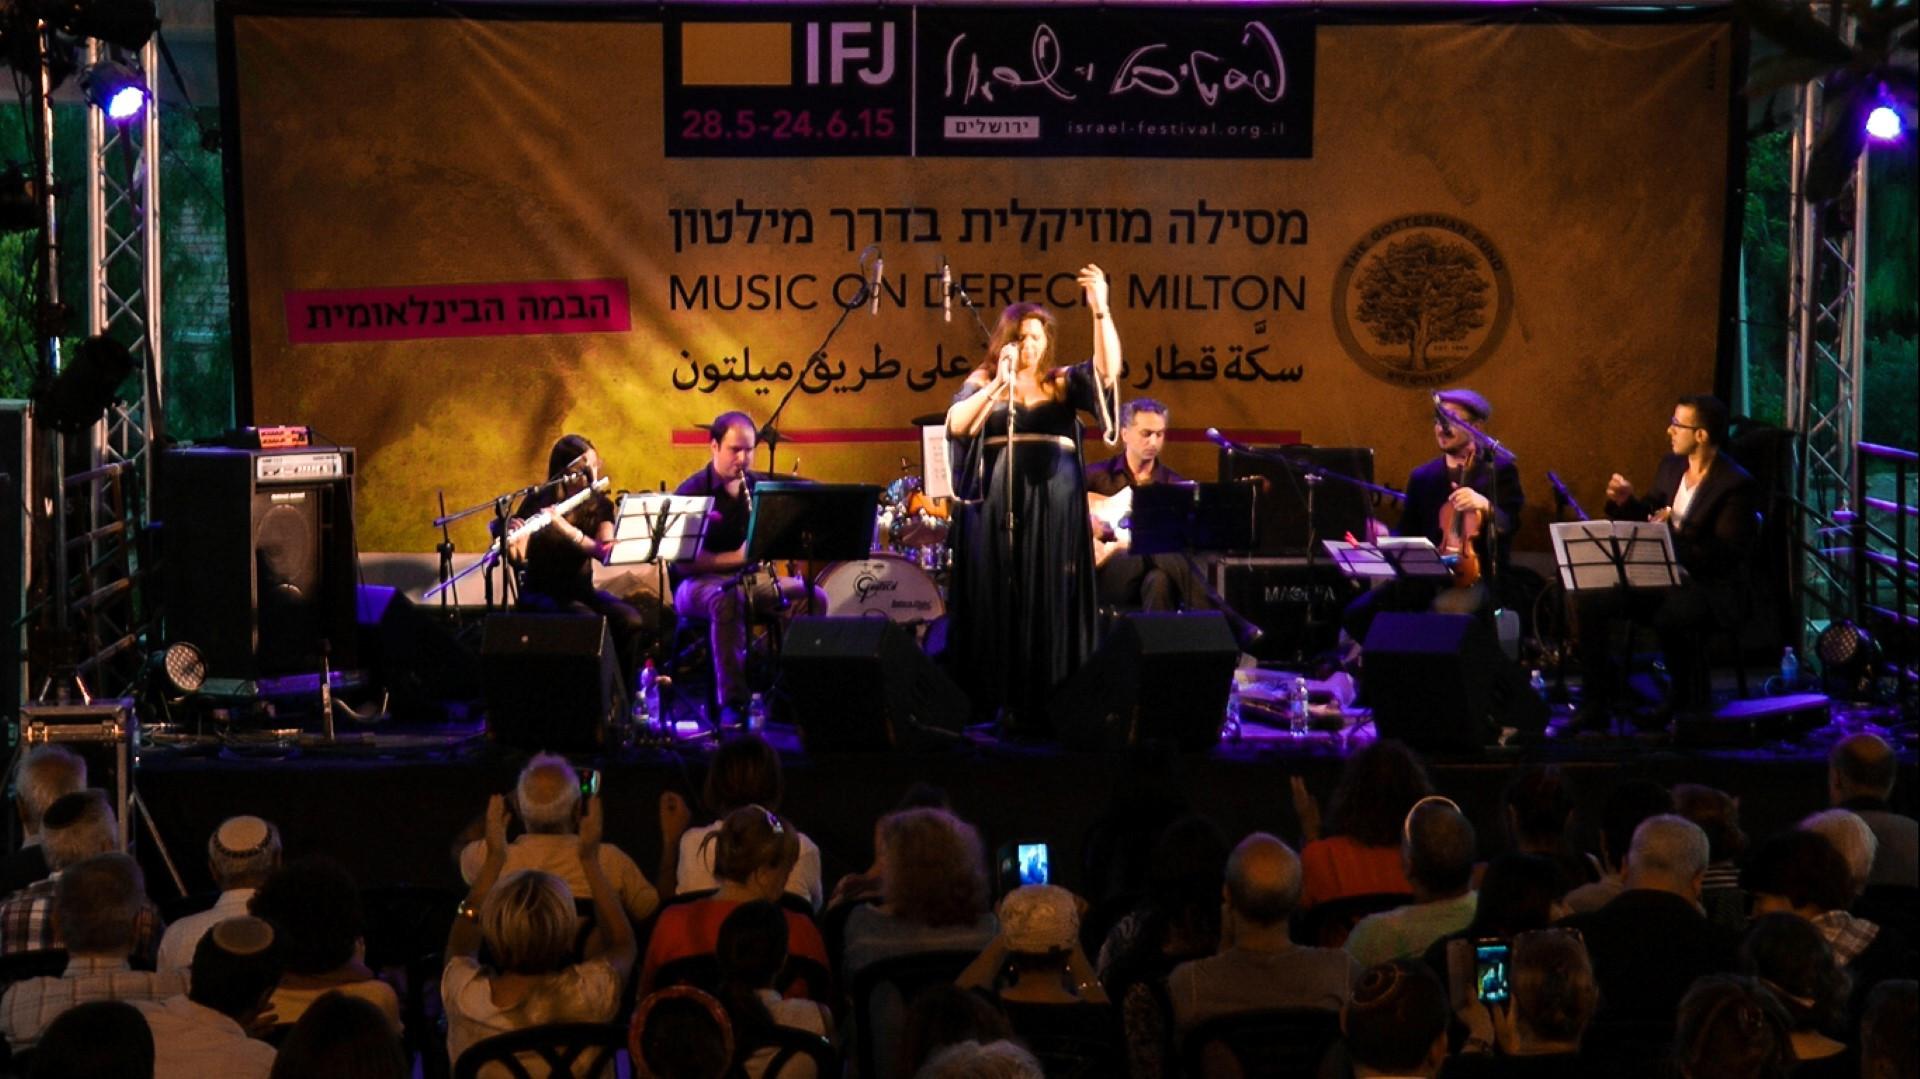 Nataly Oryon @ Israel Festival